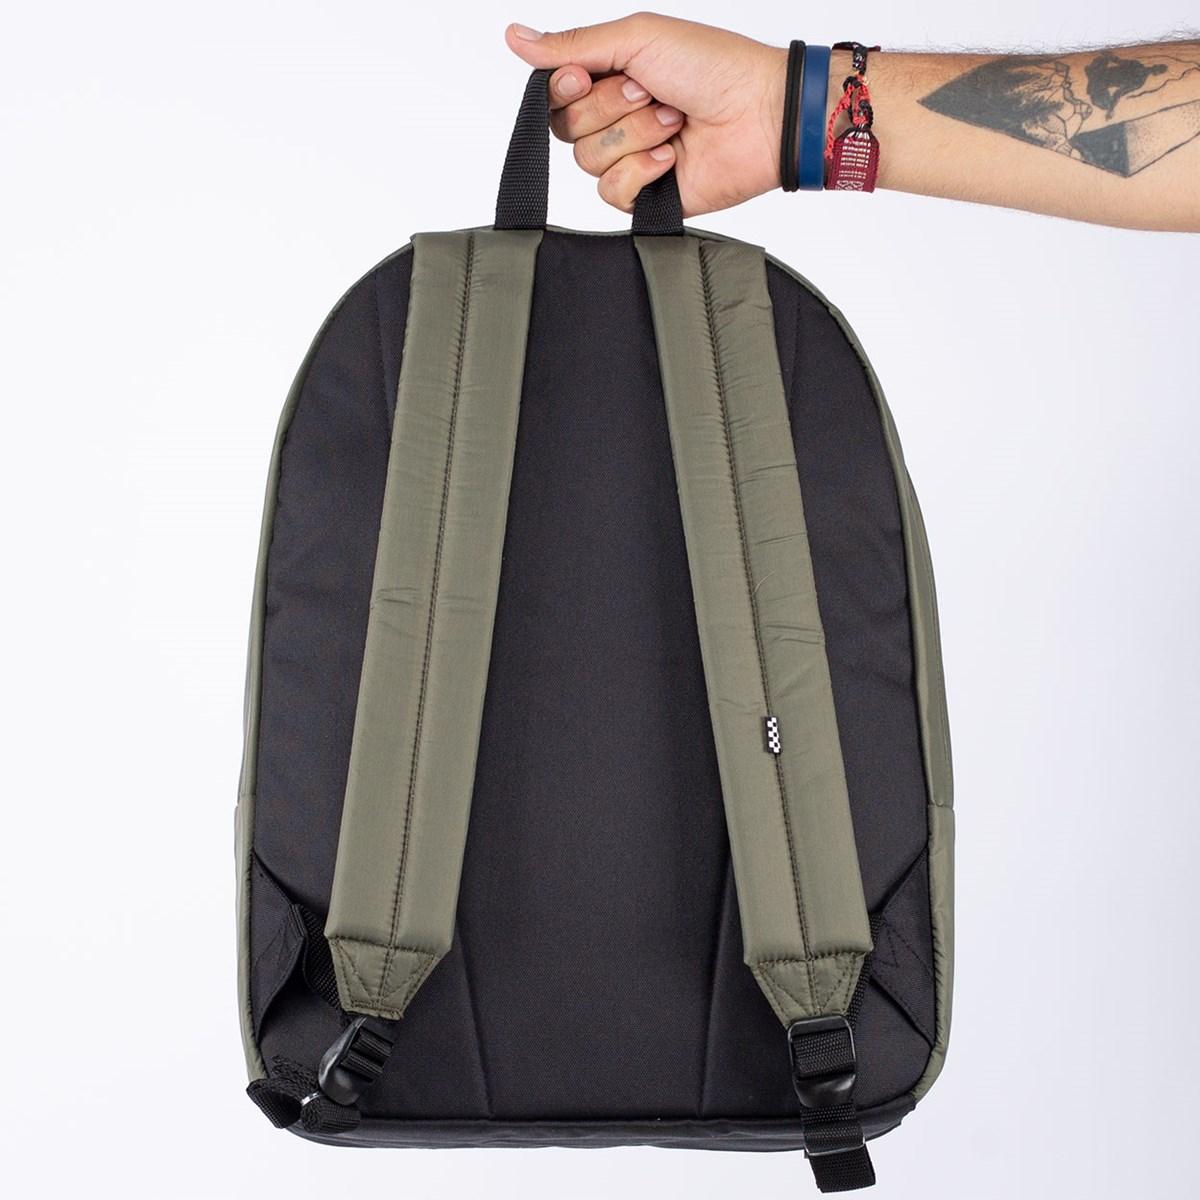 Mochila Vans Long Haul Backpack Grape Leaf VN0A4S6XKCZ